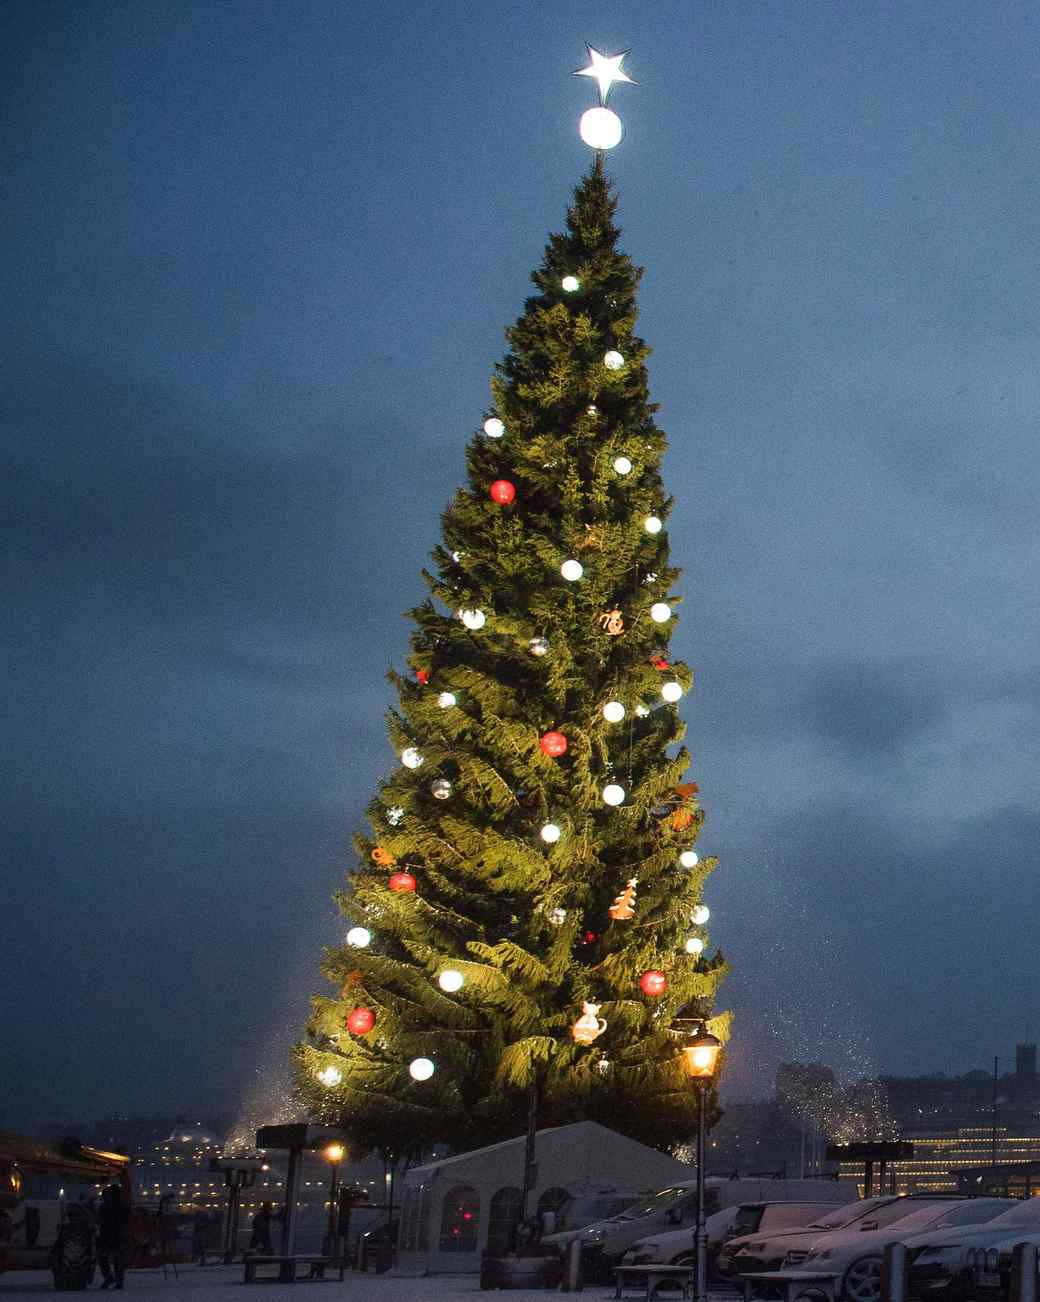 Stockholm Christmas Tree 2016